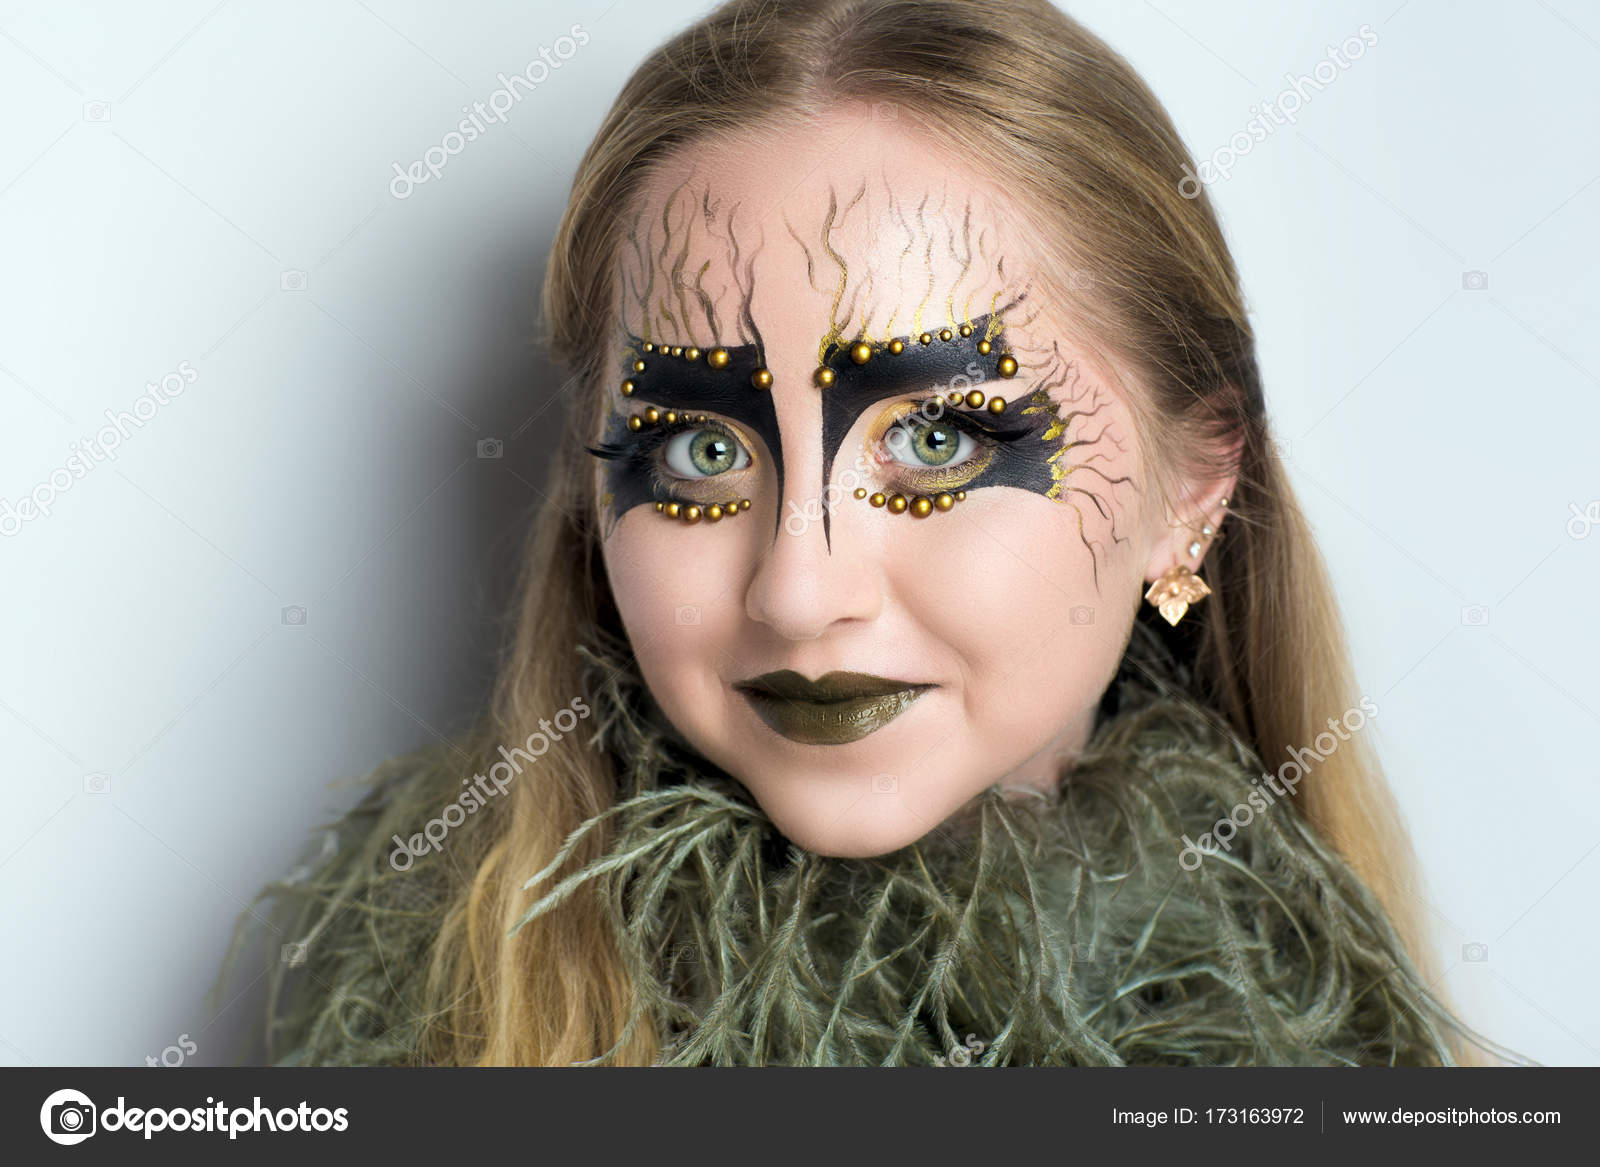 Пизда и лицо девушки на одном фото Частное фото 69